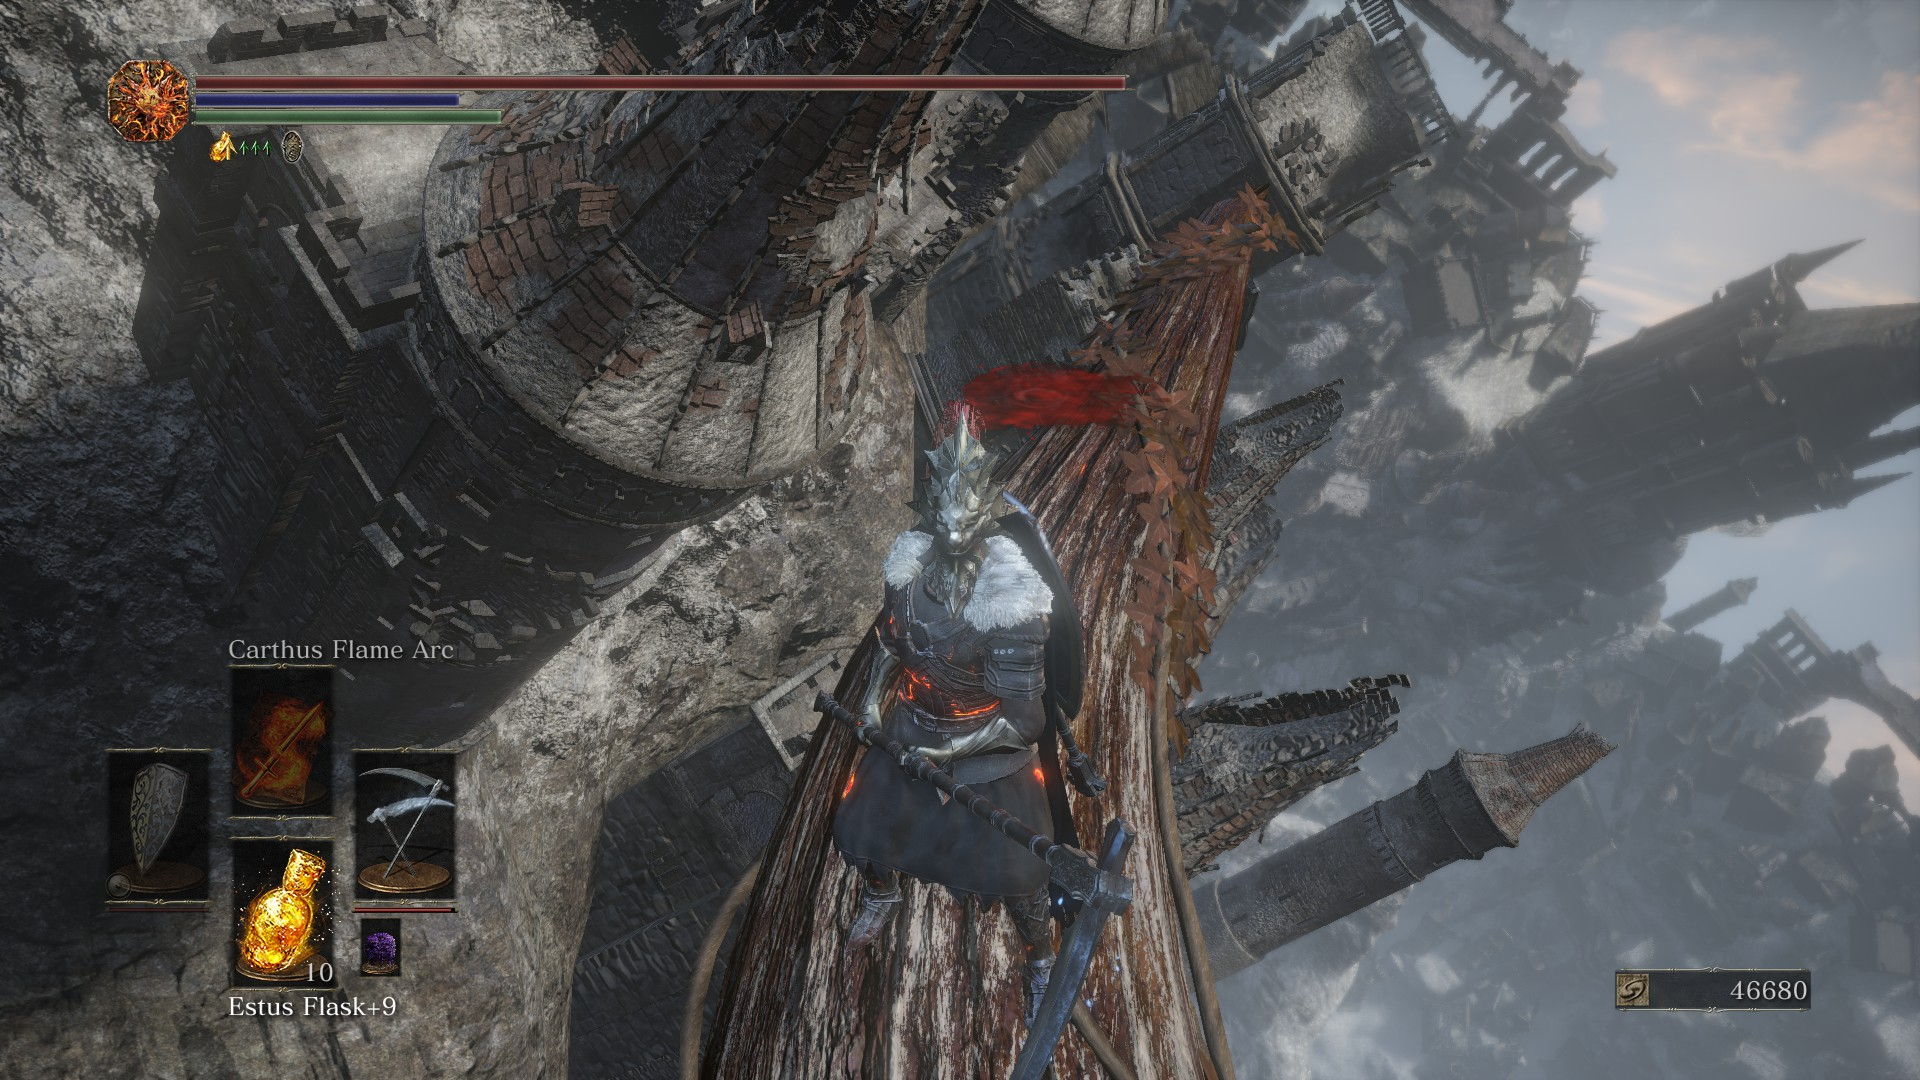 Review Dark Souls 3 The Ringed City Ups And Downs Shacknews